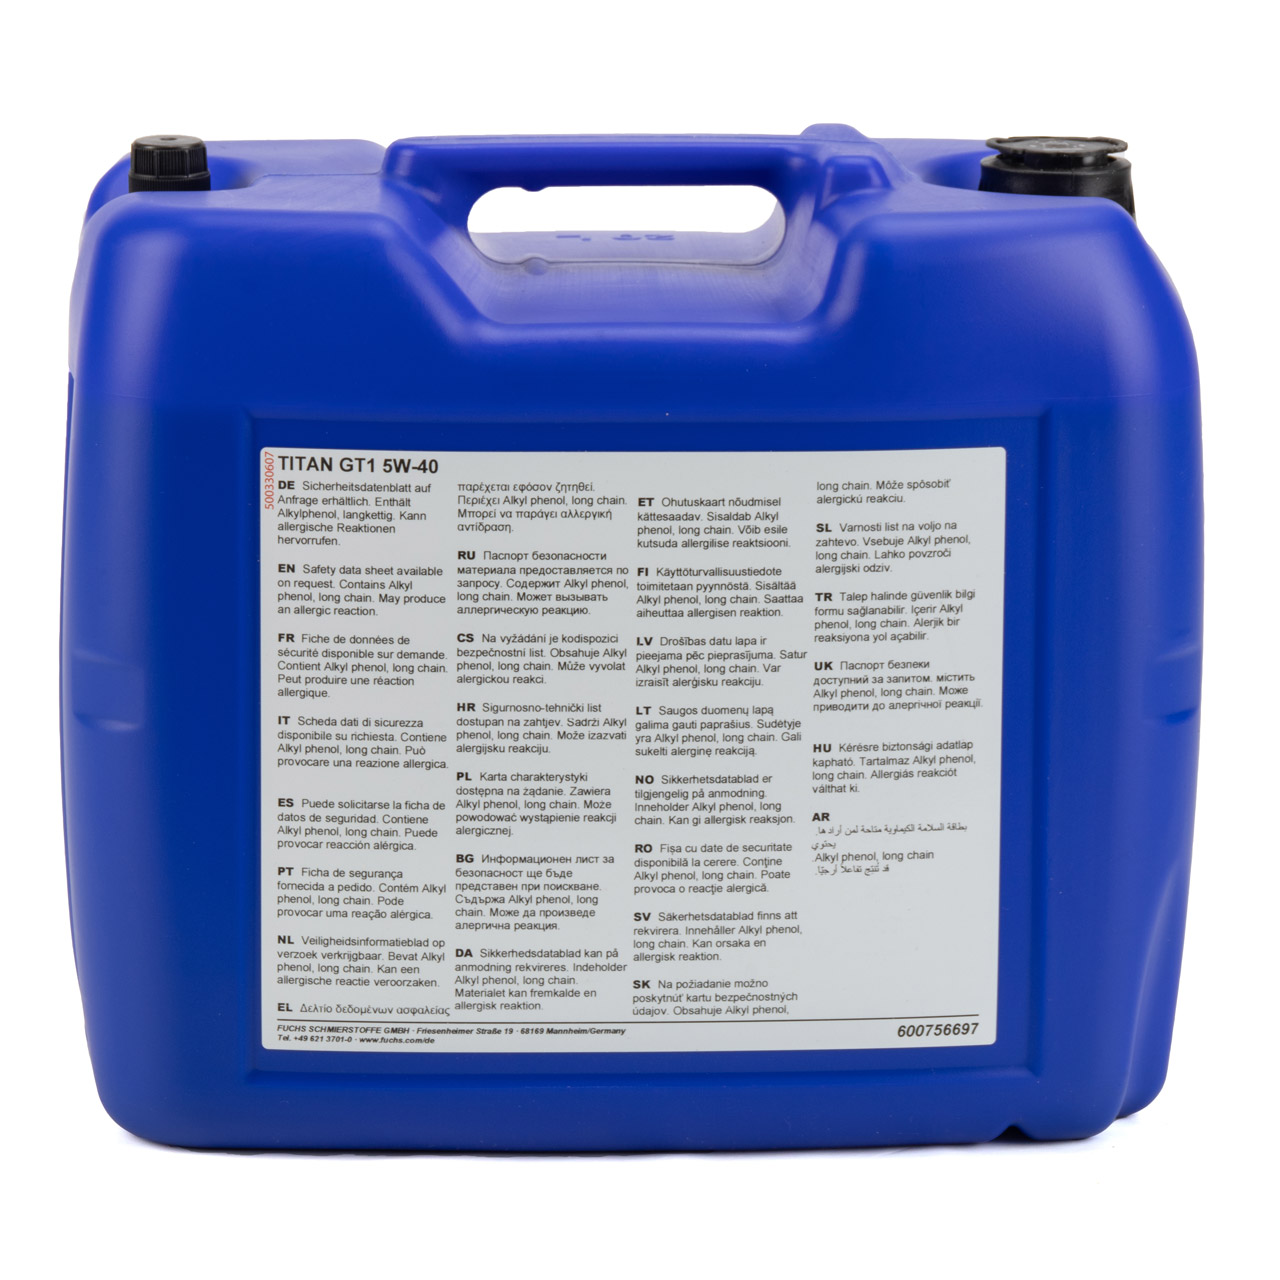 FUCHS Motoröl Öl TITAN GT1 5W-40 5W40 ACEA C3 API SN/SM FORD M2C917-A - 20 Liter